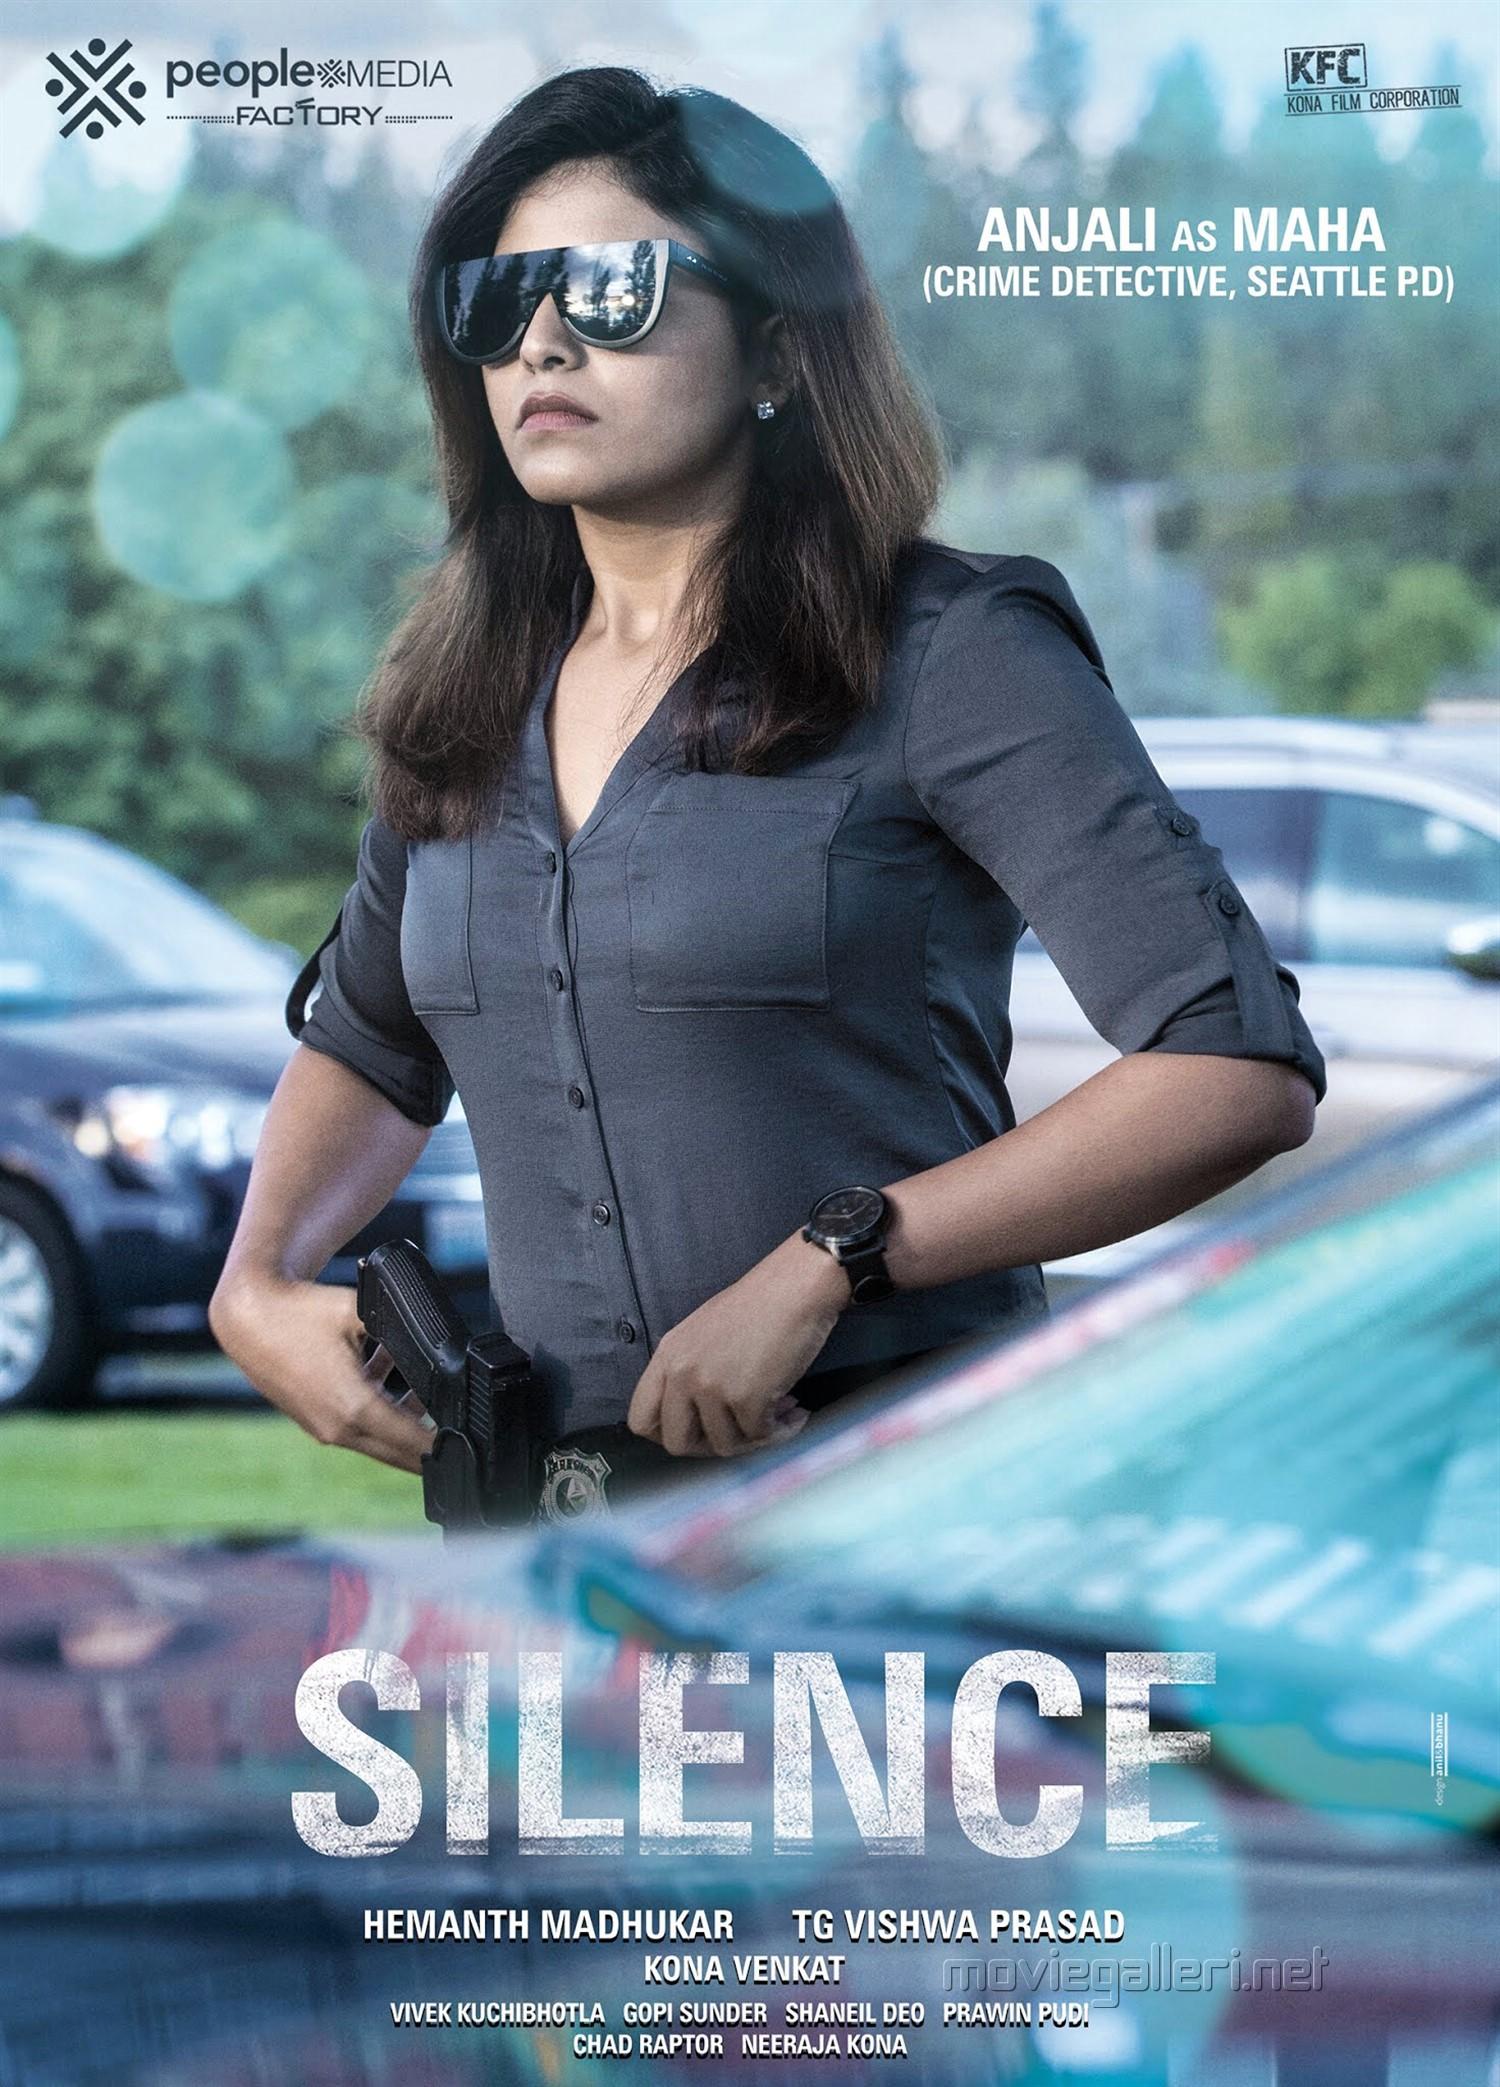 Actress Anjali as Maha in Silence Movie Poster HD